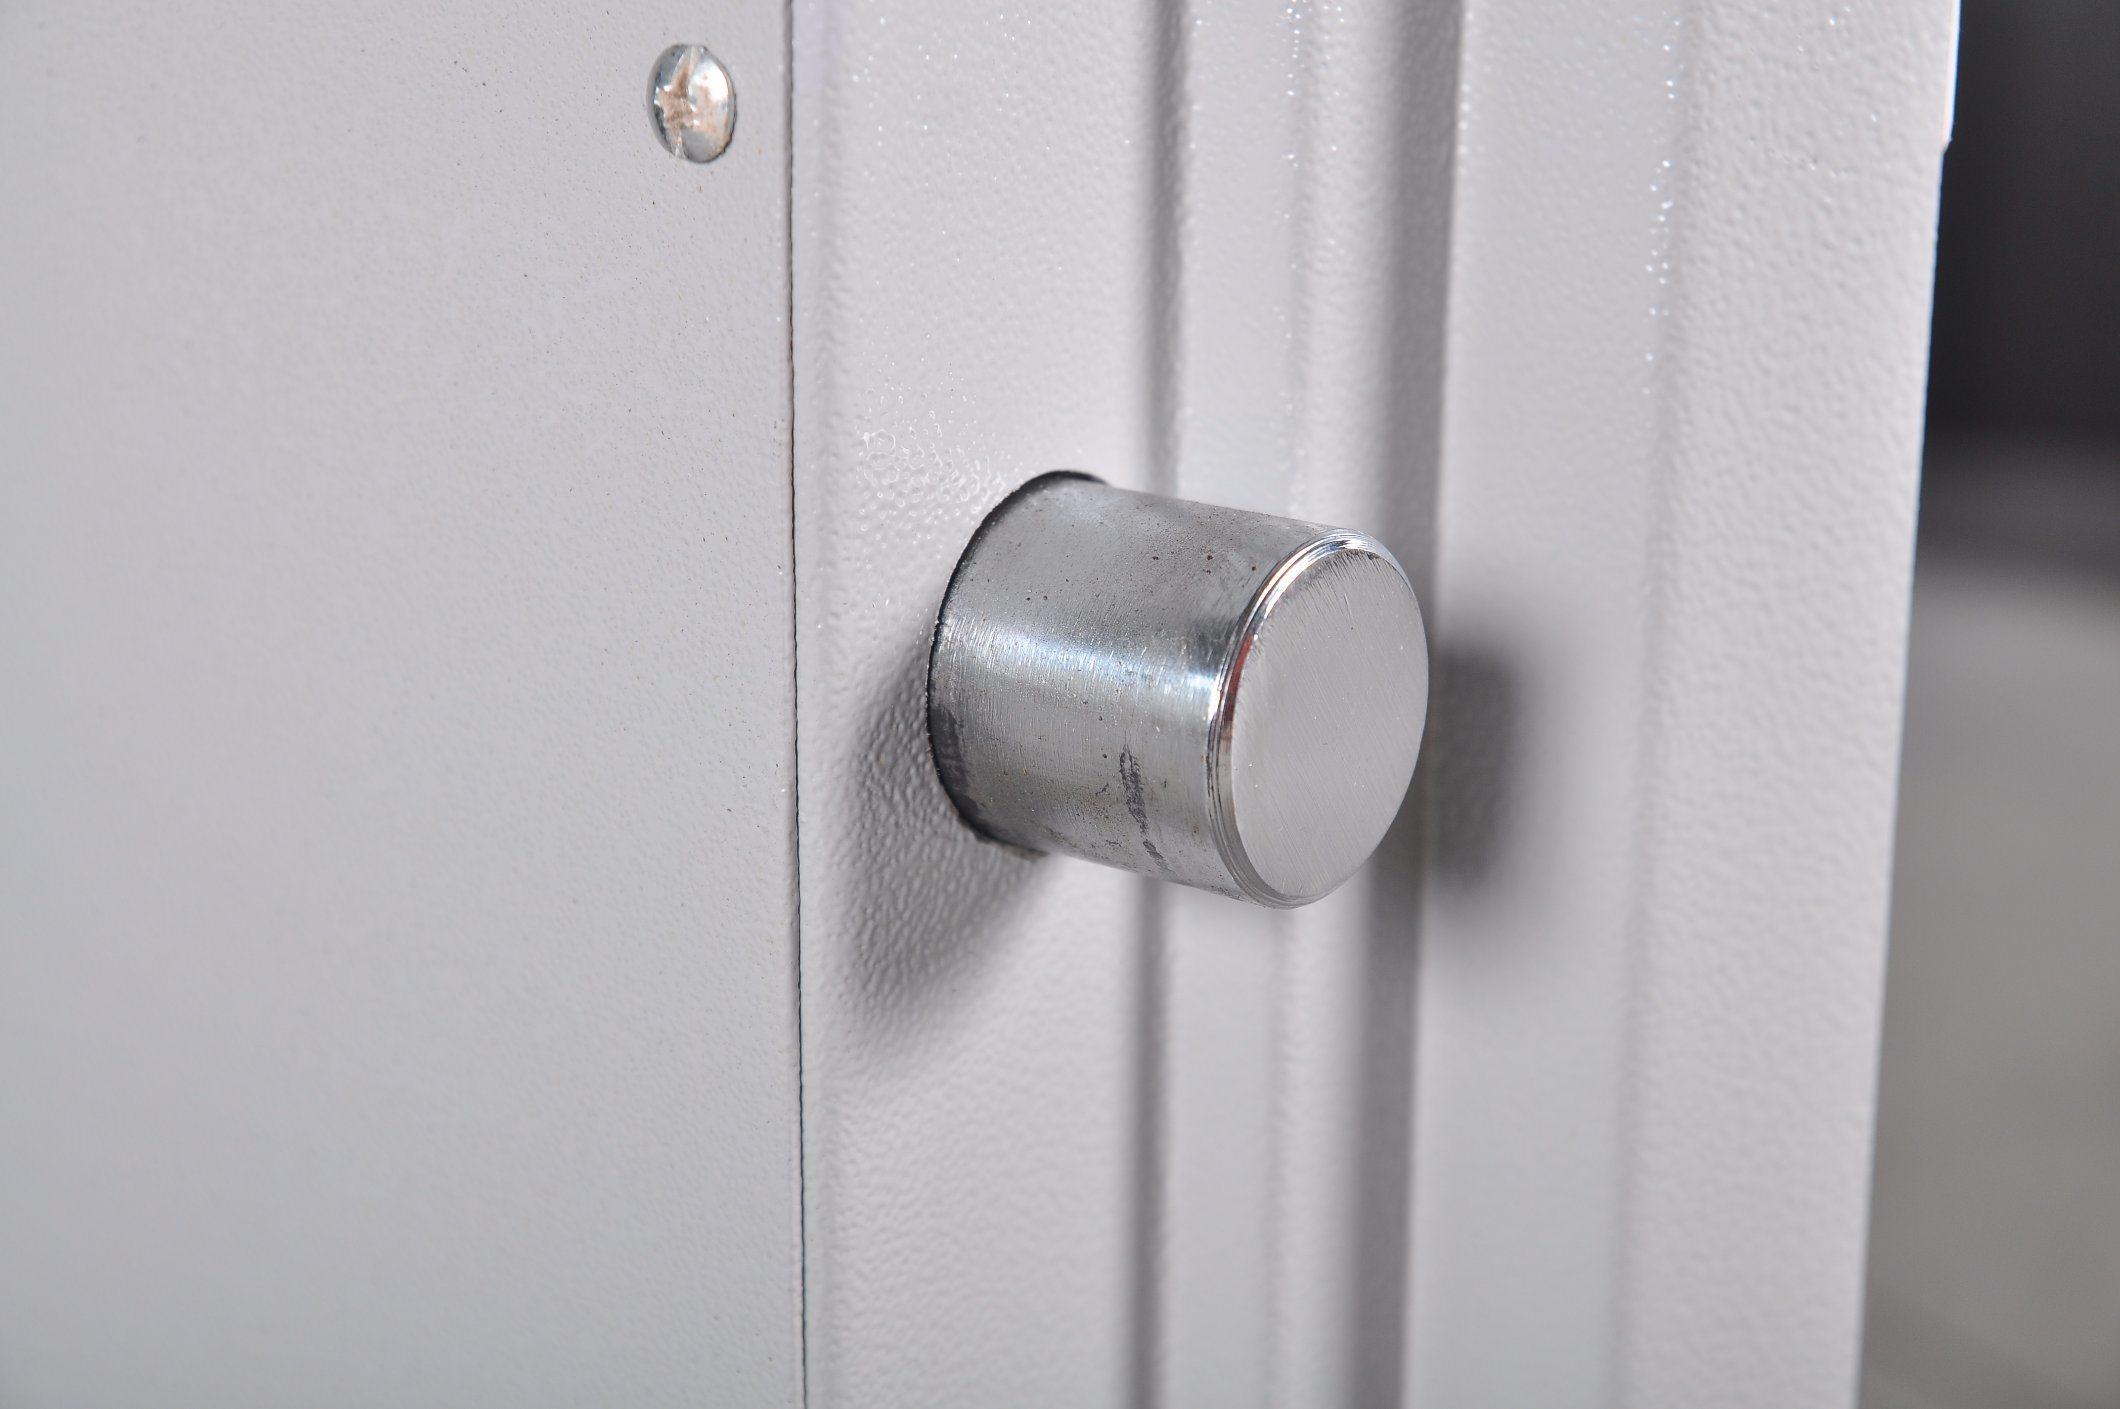 digital office door handle locks. Digital Office Door Handle Locks. Hotel Home Use Lock Big Money Safe Box Locks R